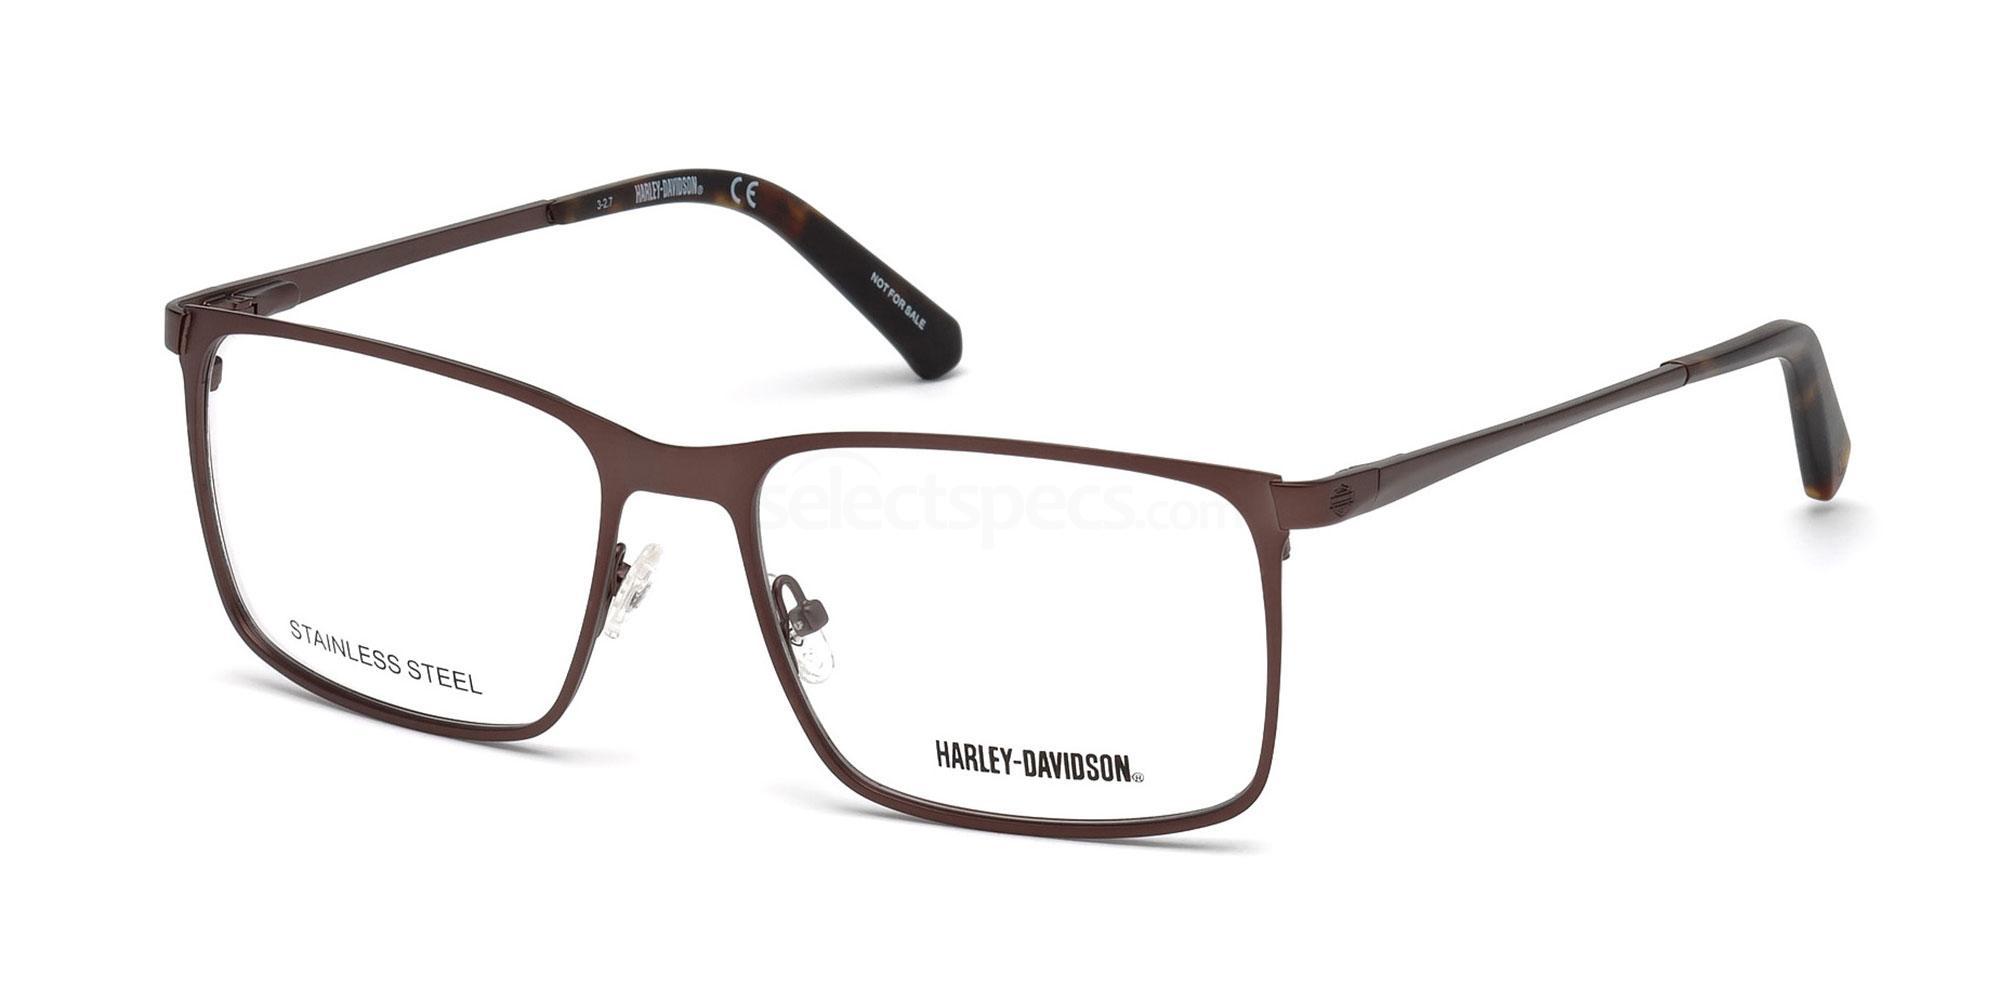 049 HD0777 Glasses, Harley Davidson